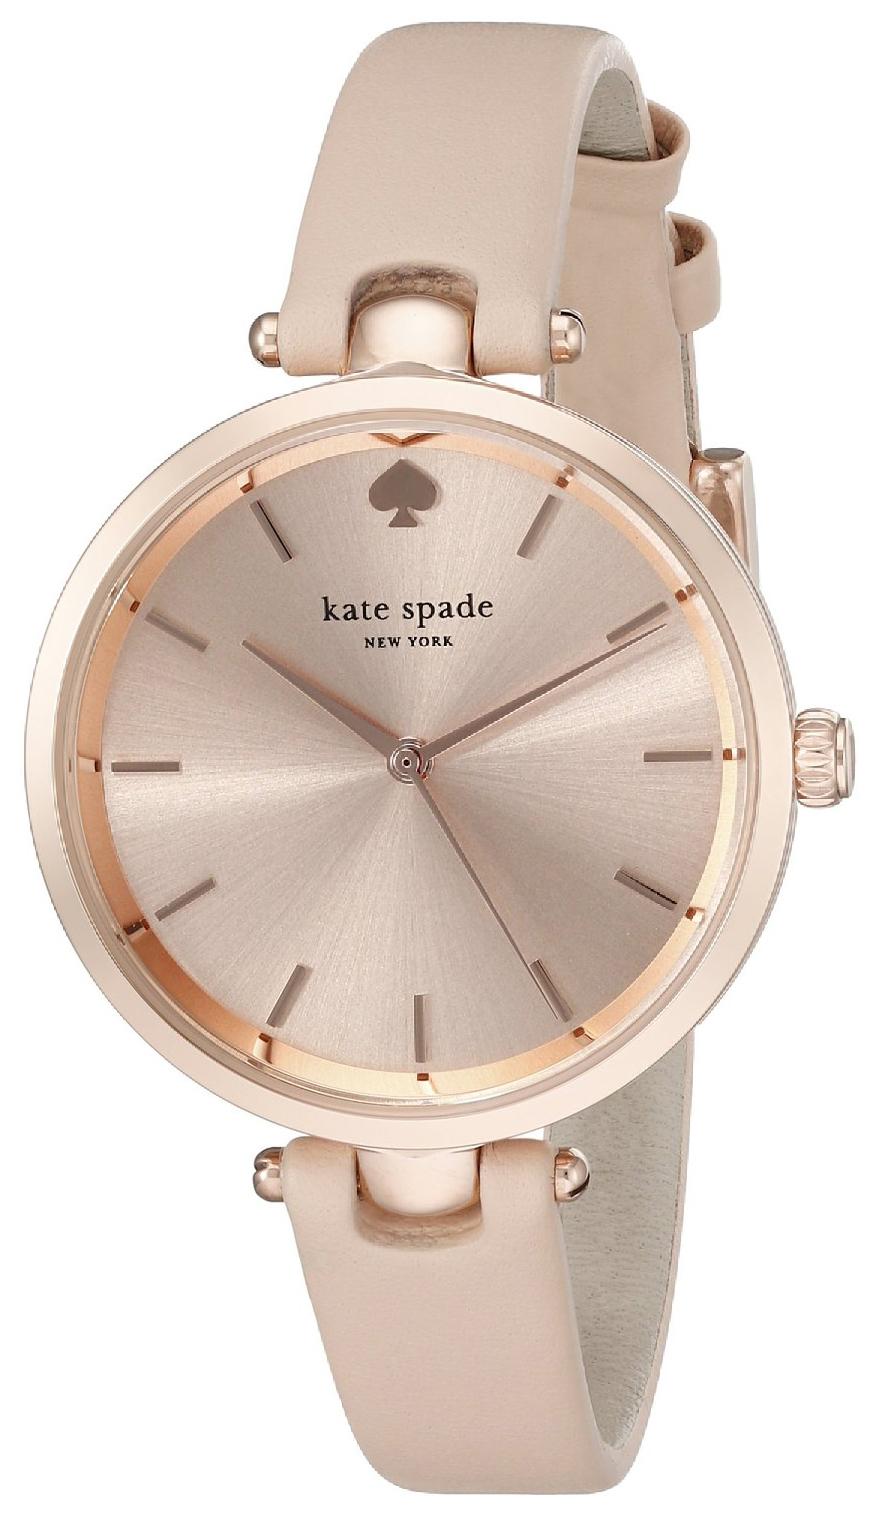 Kate Spade 99999 Damklocka 1YRU0812 Roséguldstonad/Läder Ø34 mm - Kate Spade